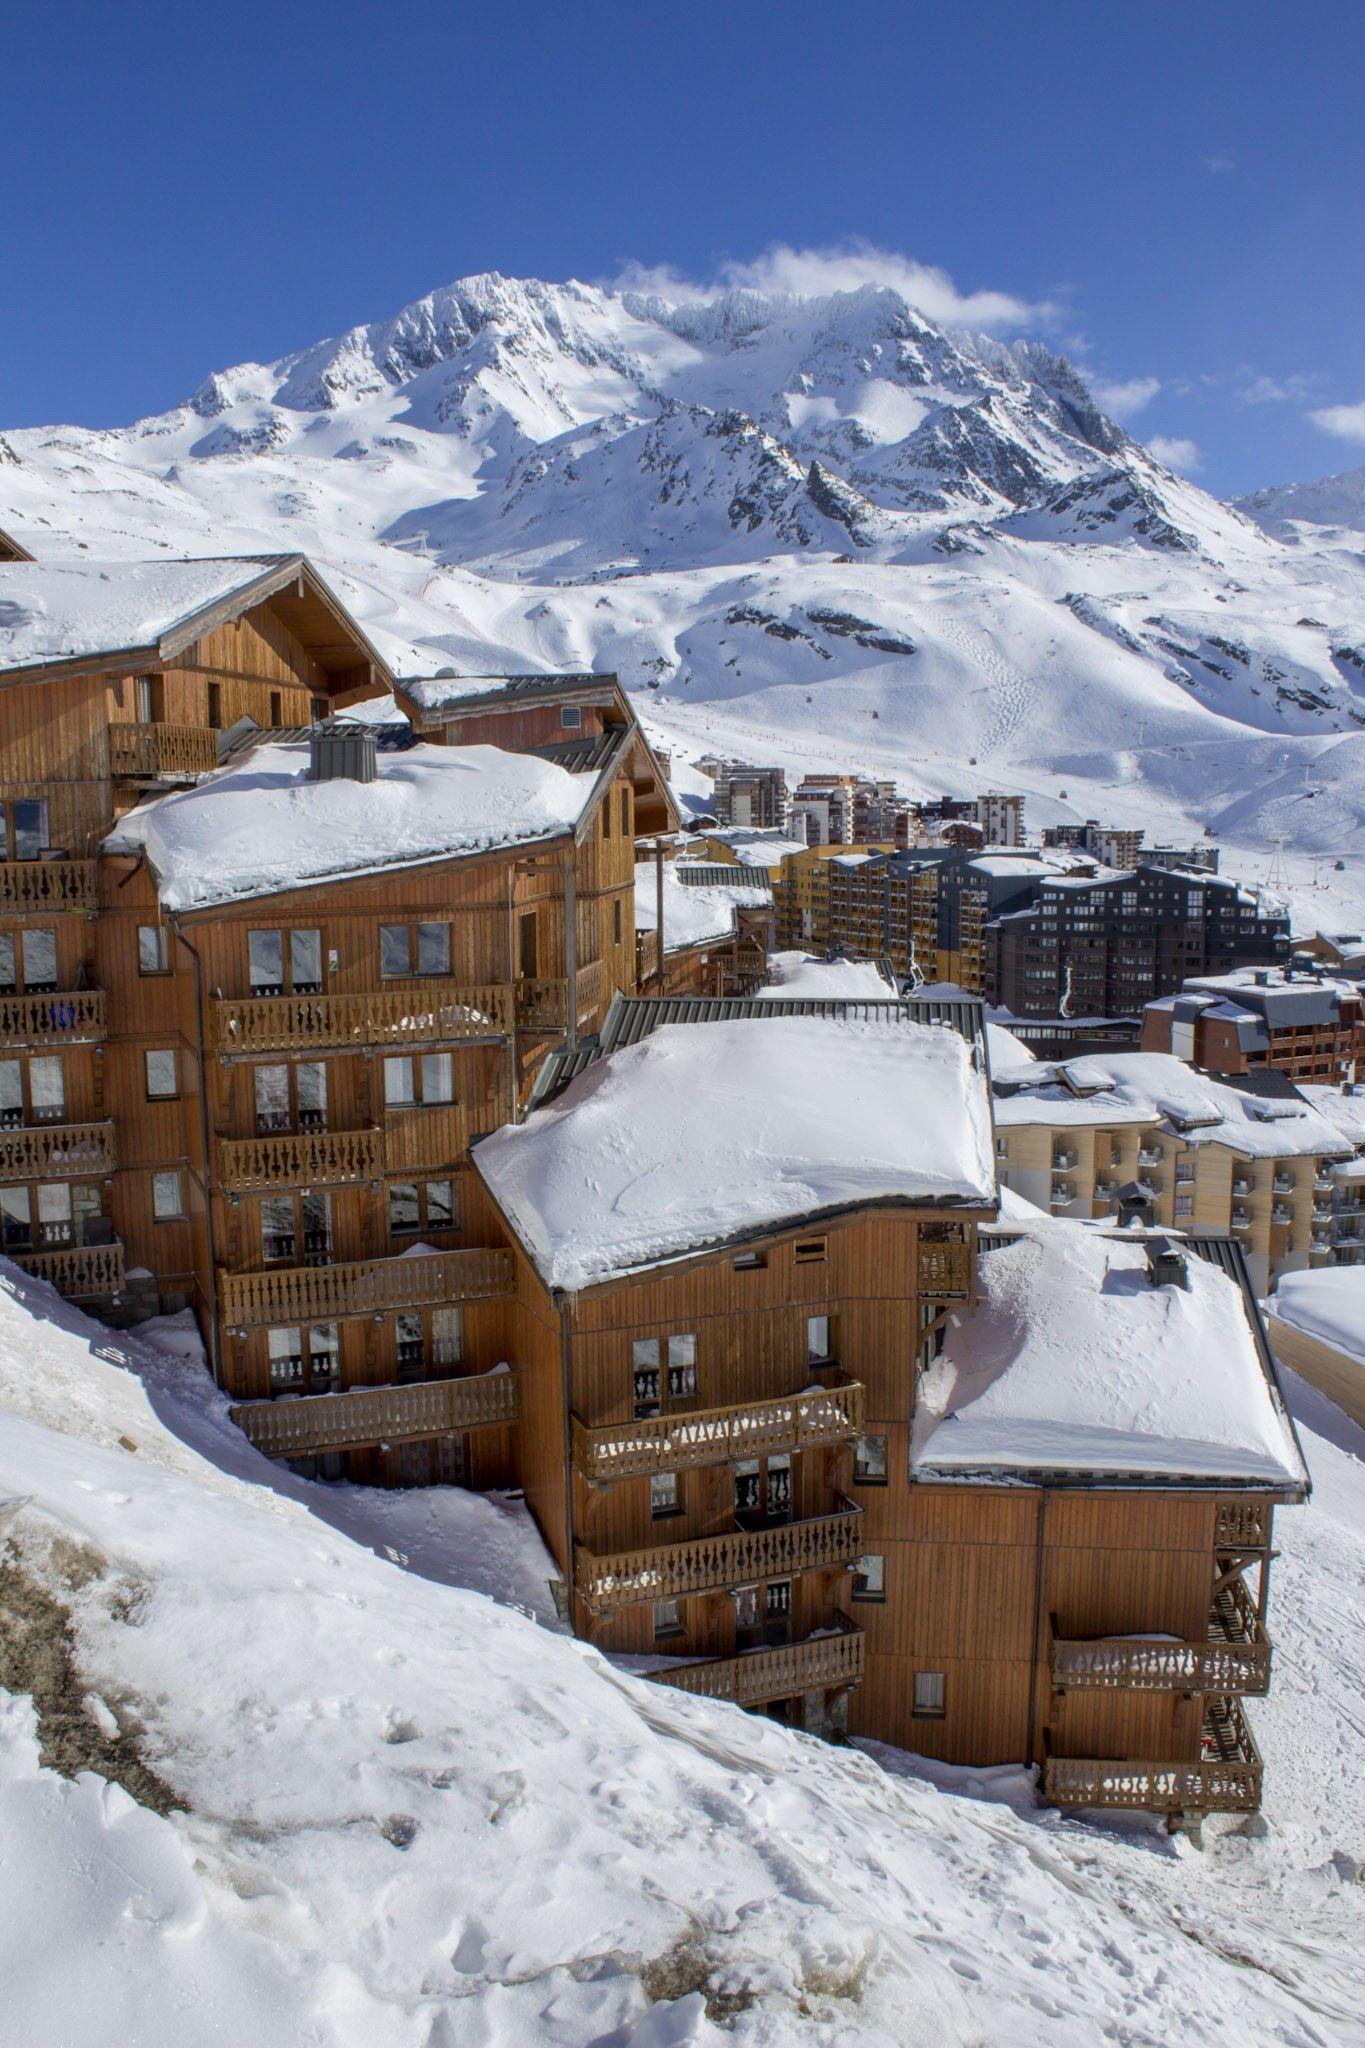 Balcons de Val Thorens, Val Thorens, France #snow #mountains #france #alps | Mountains, Alps, Travel